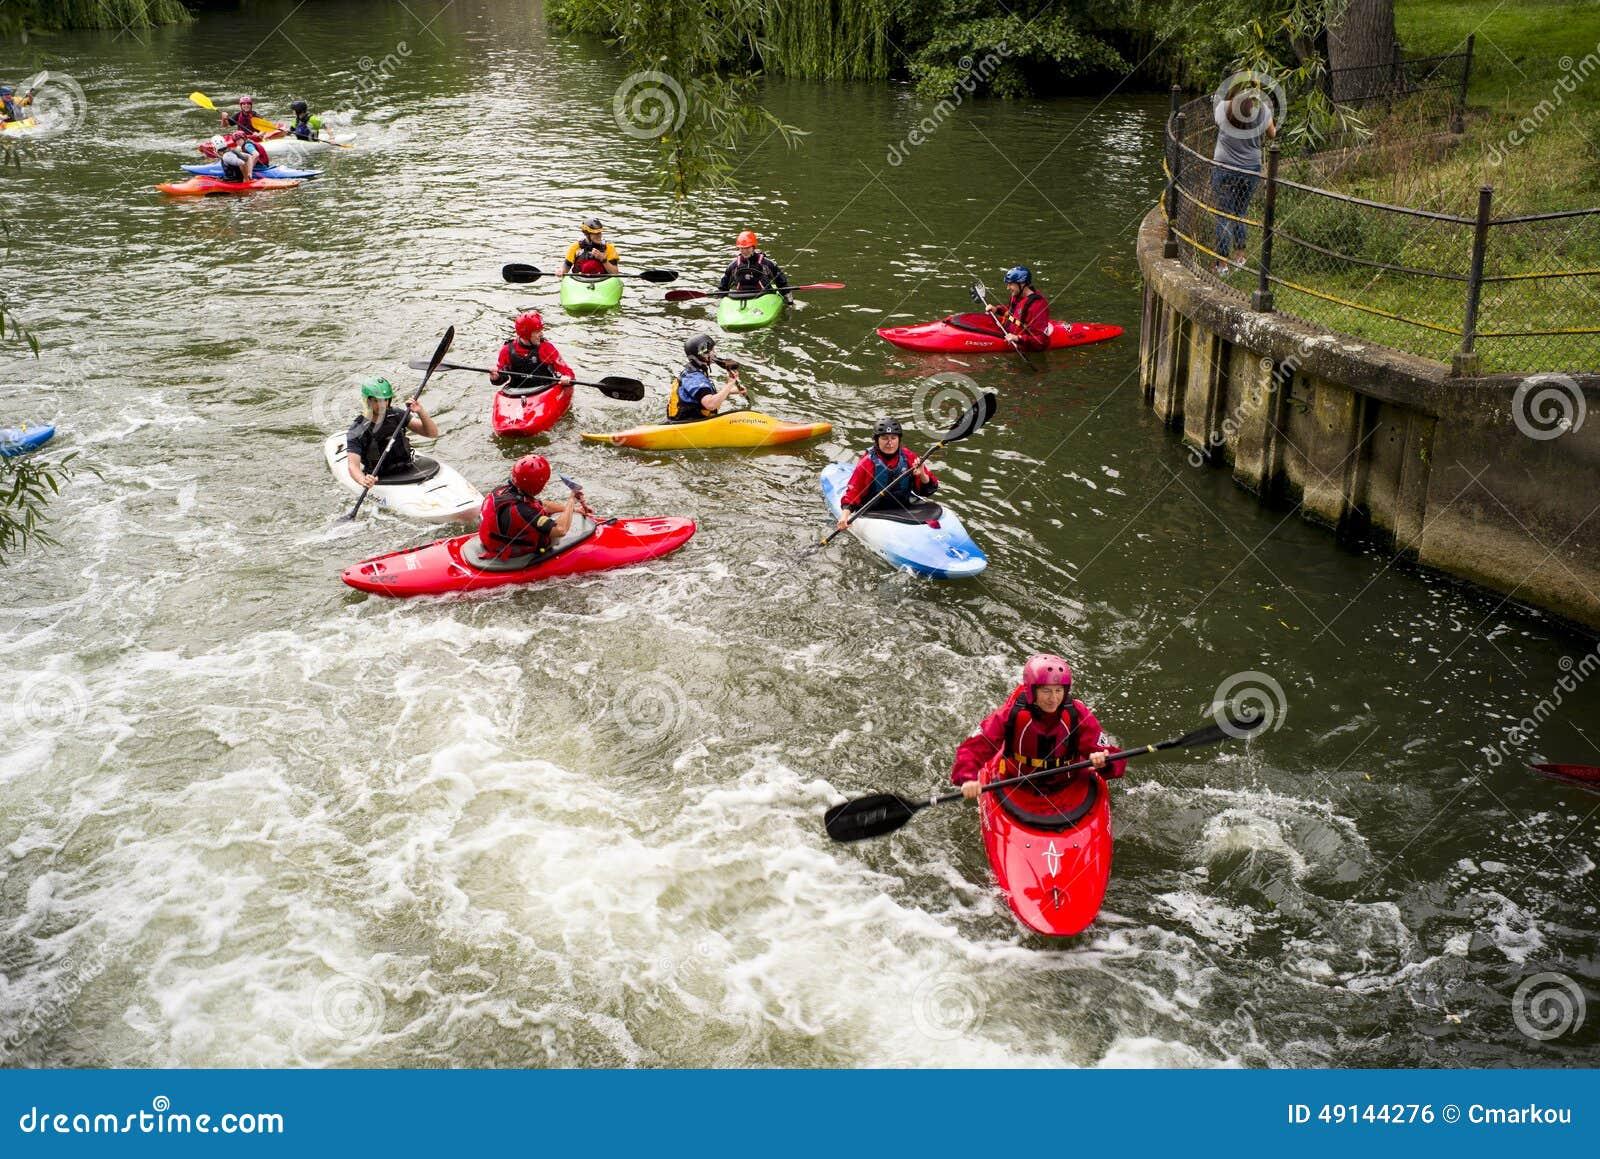 Download Kayak Practice In River Cam Editorial Photo - Image of rapids, kayakers: 49144276